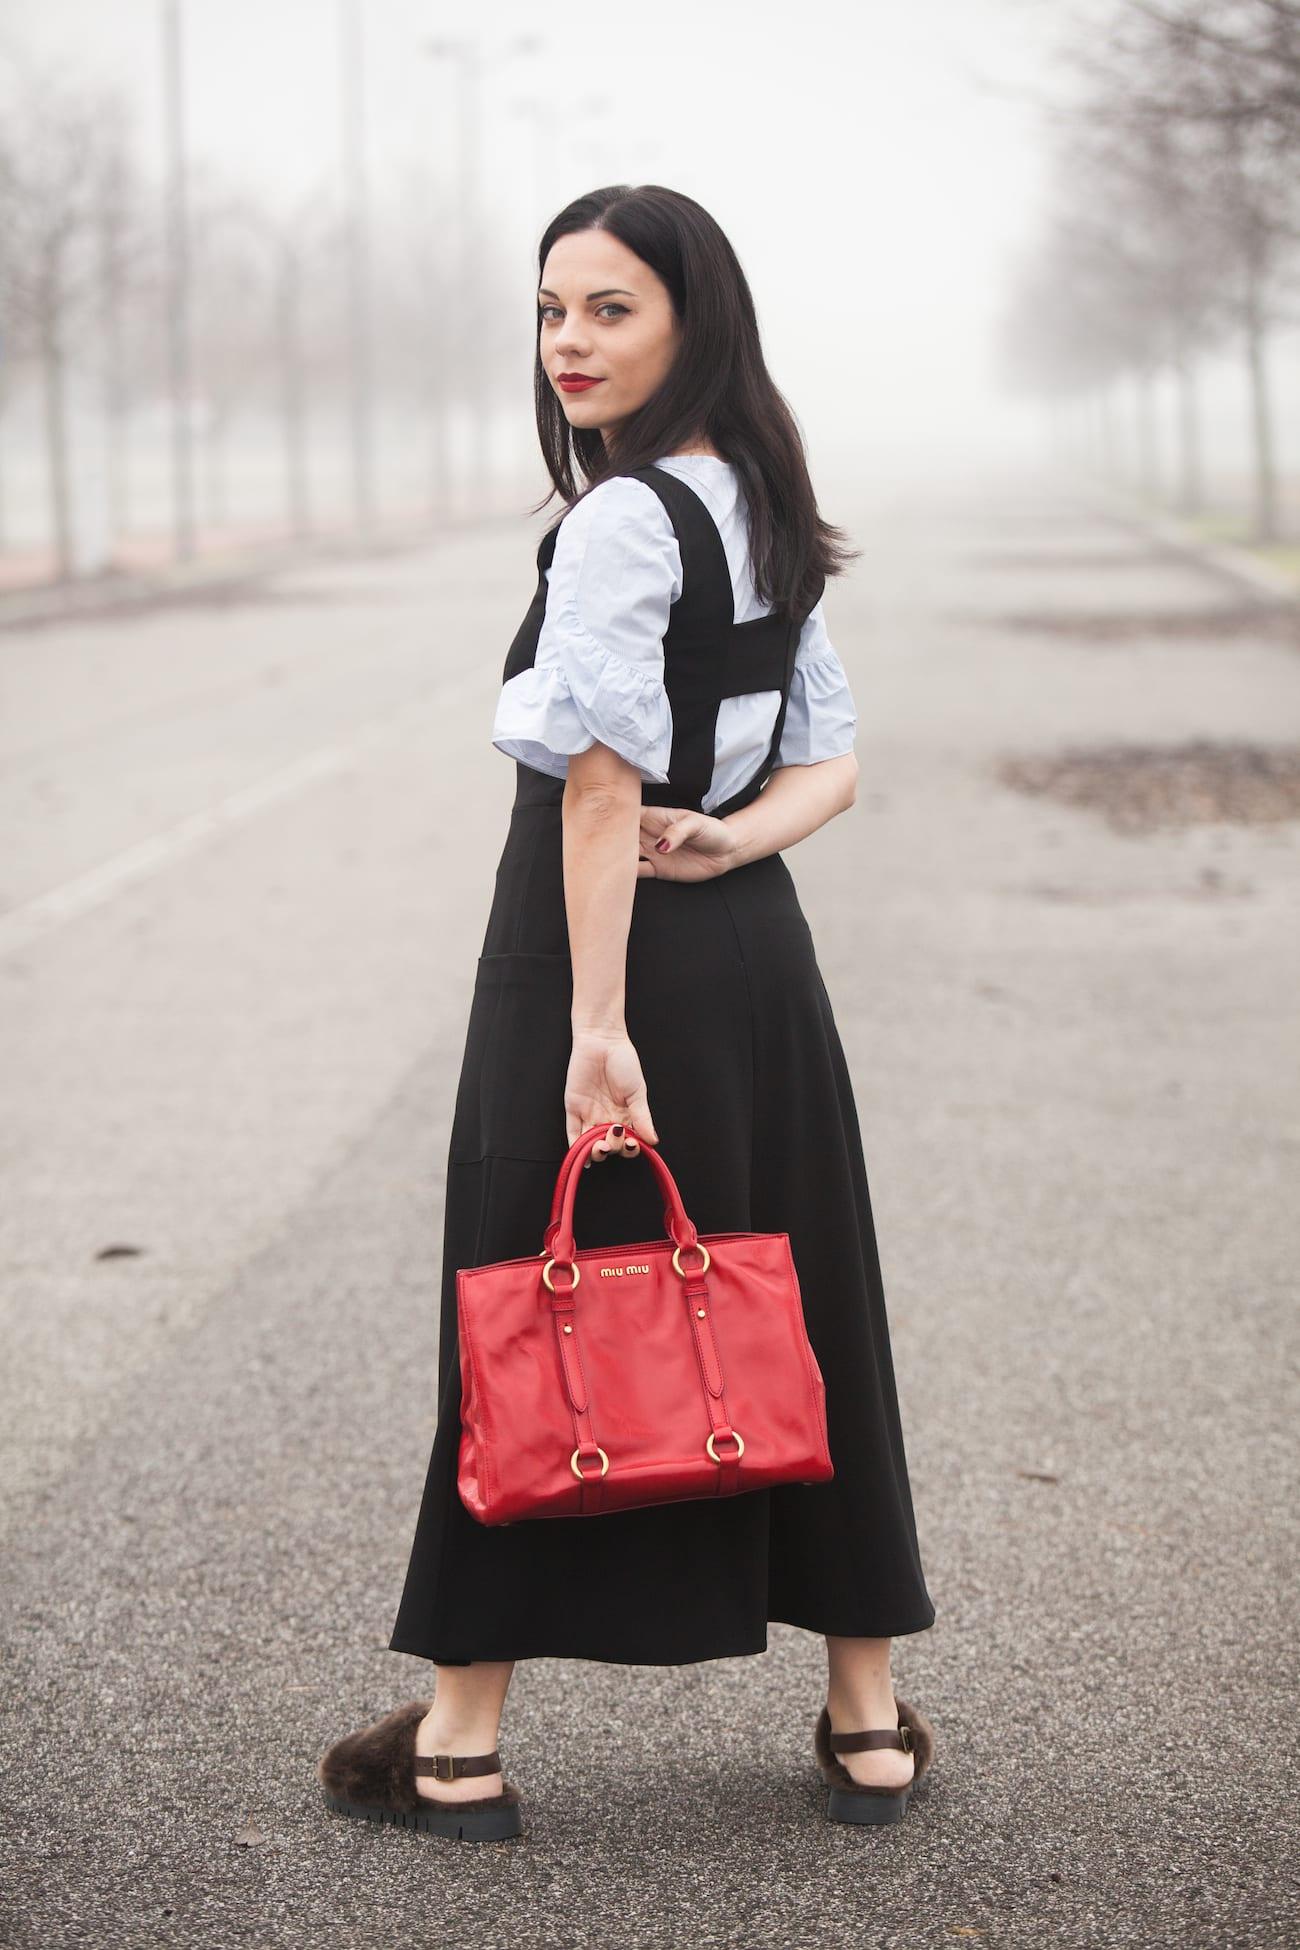 elena schiavon fashion blogger